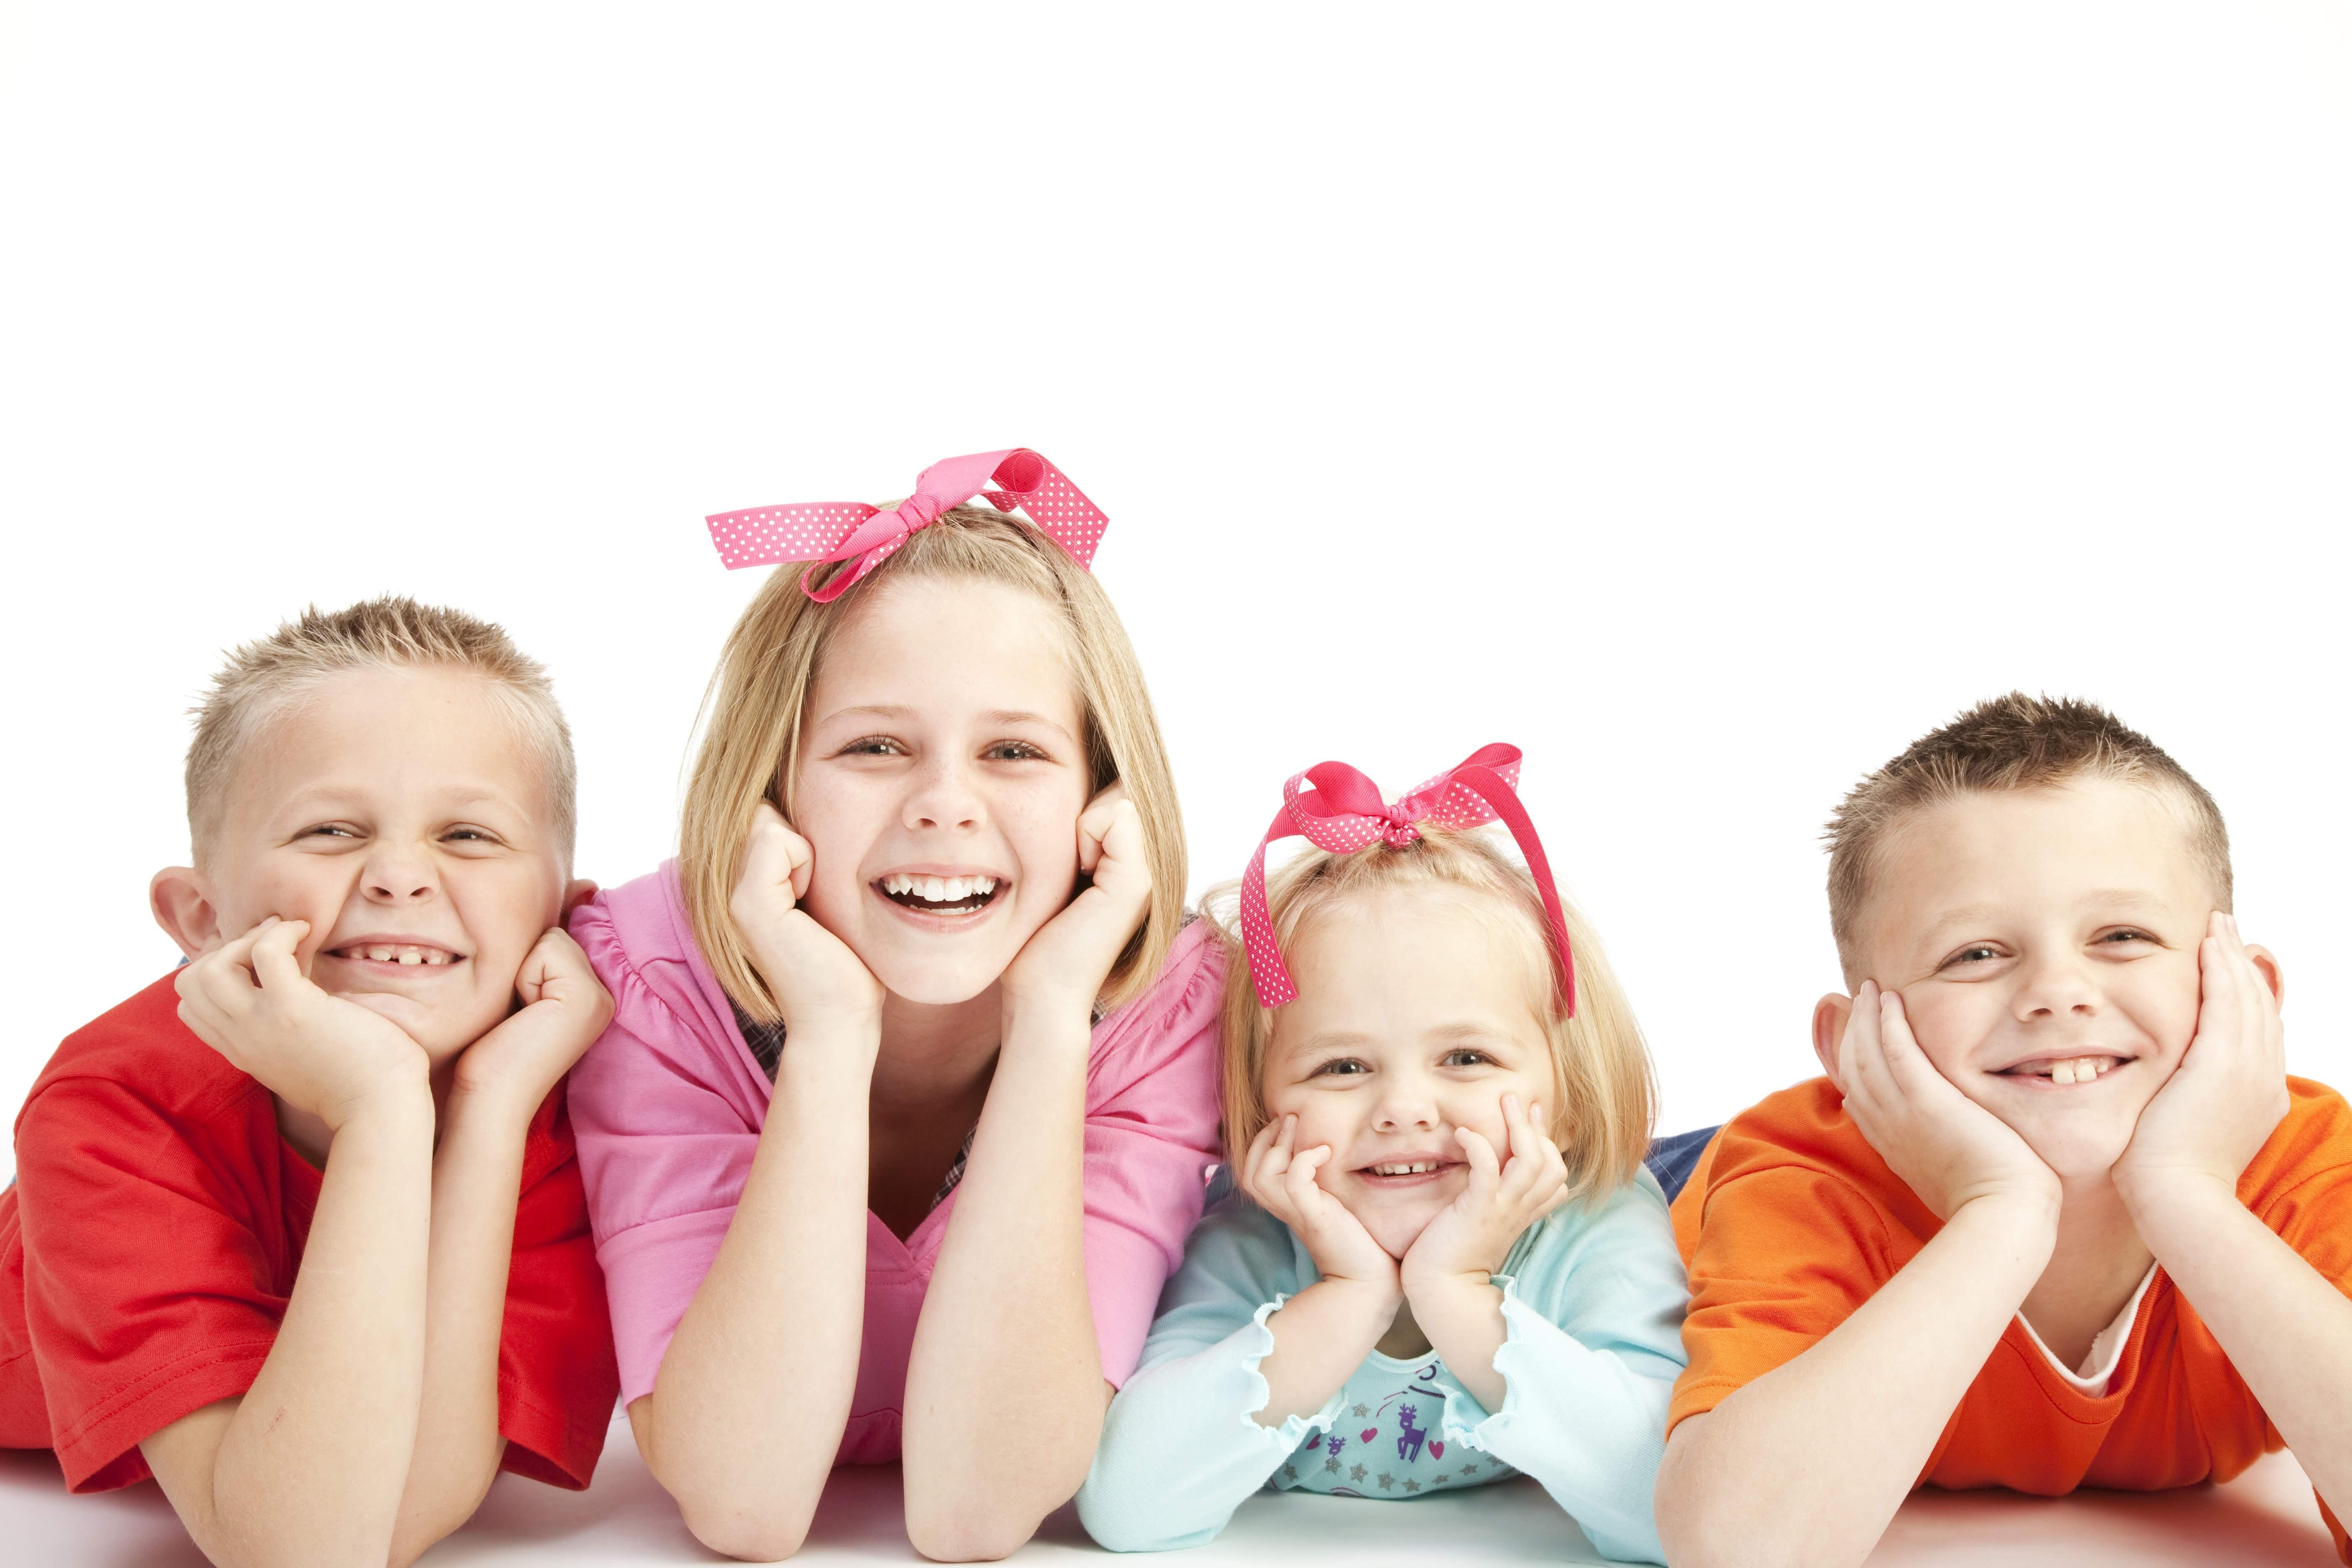 Children HD PNG - 96163